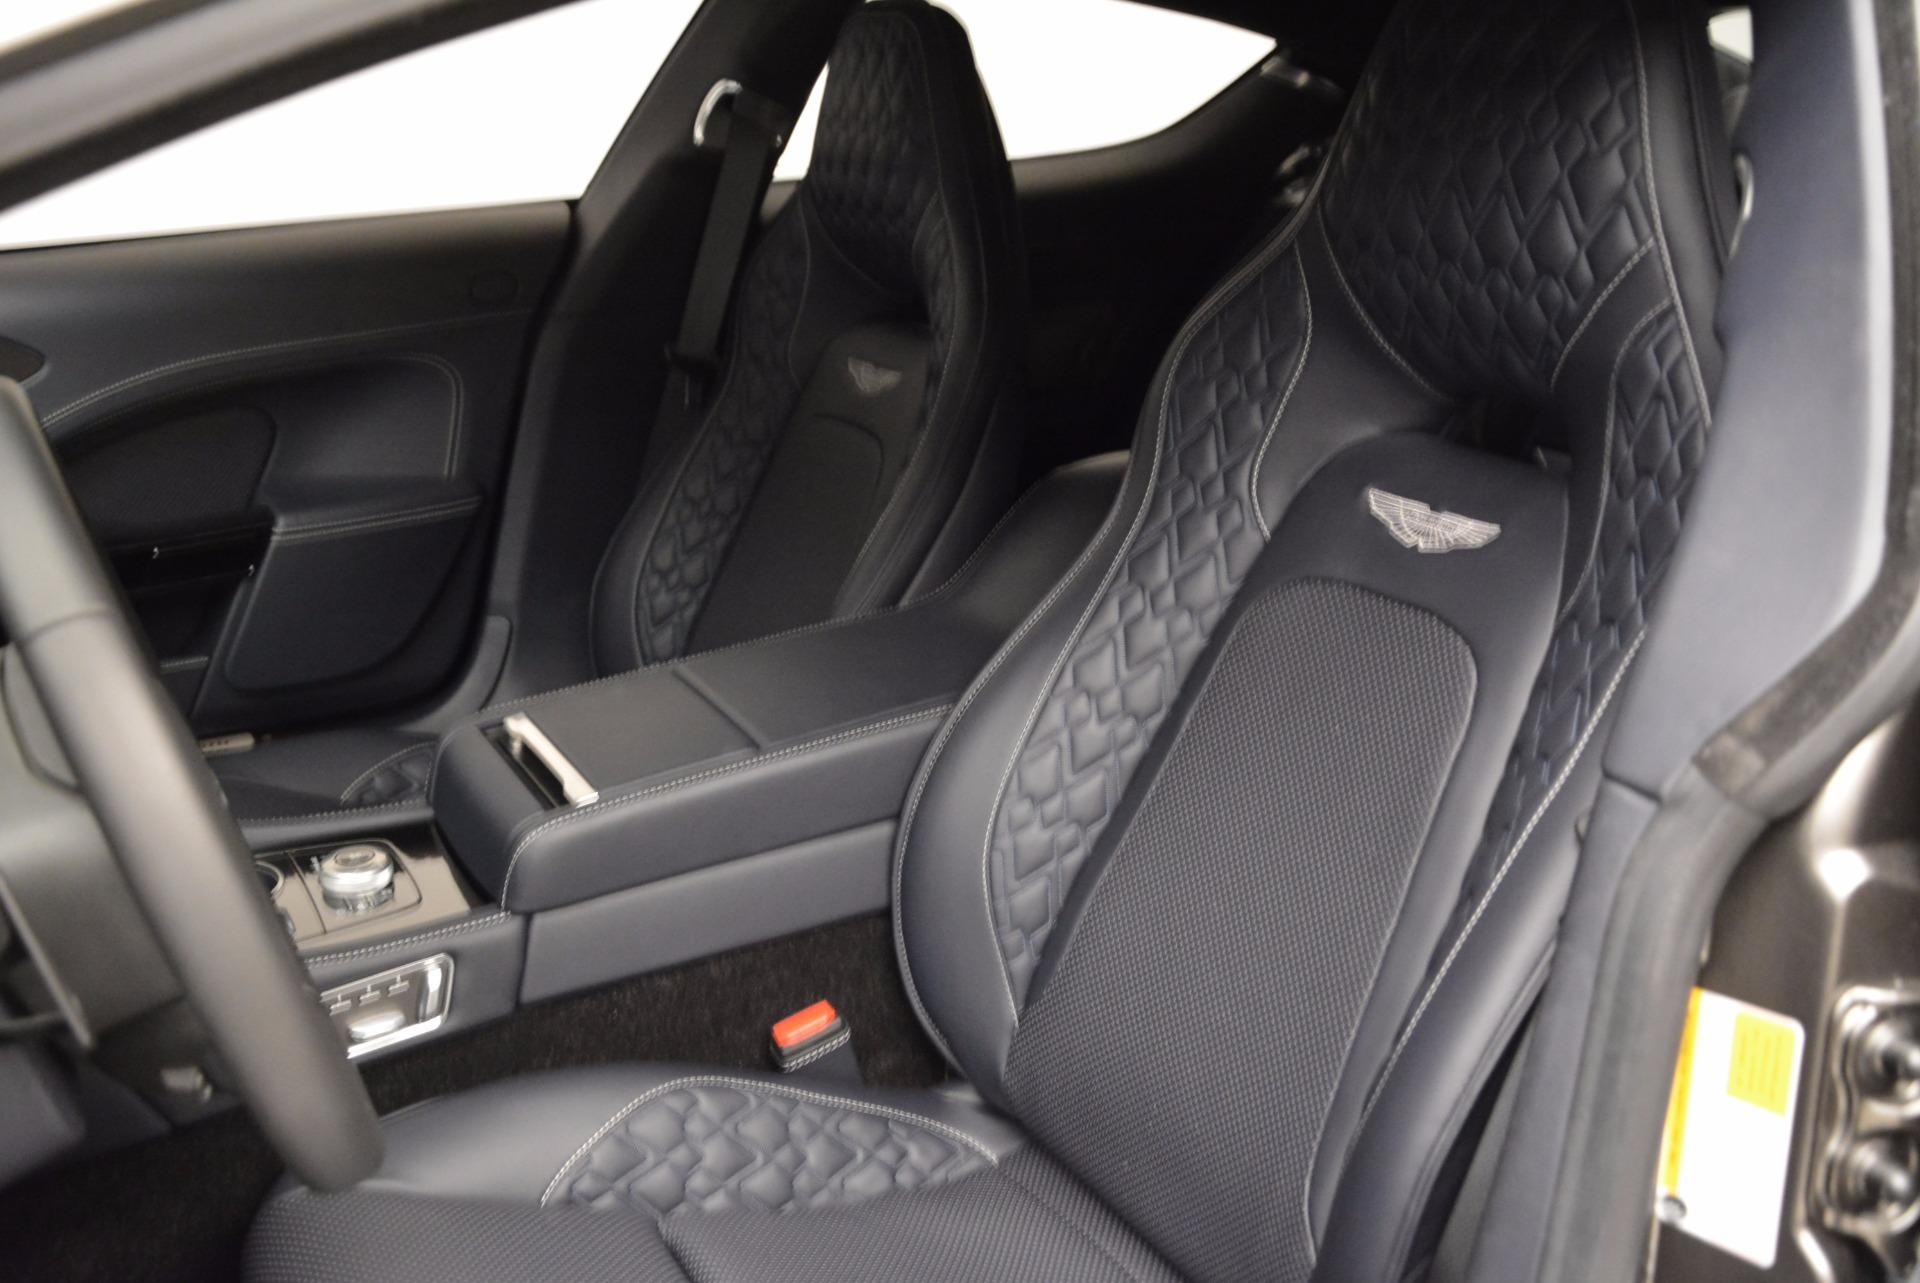 Used 2017 Aston Martin Rapide S Sedan For Sale In Greenwich, CT 1843_p15